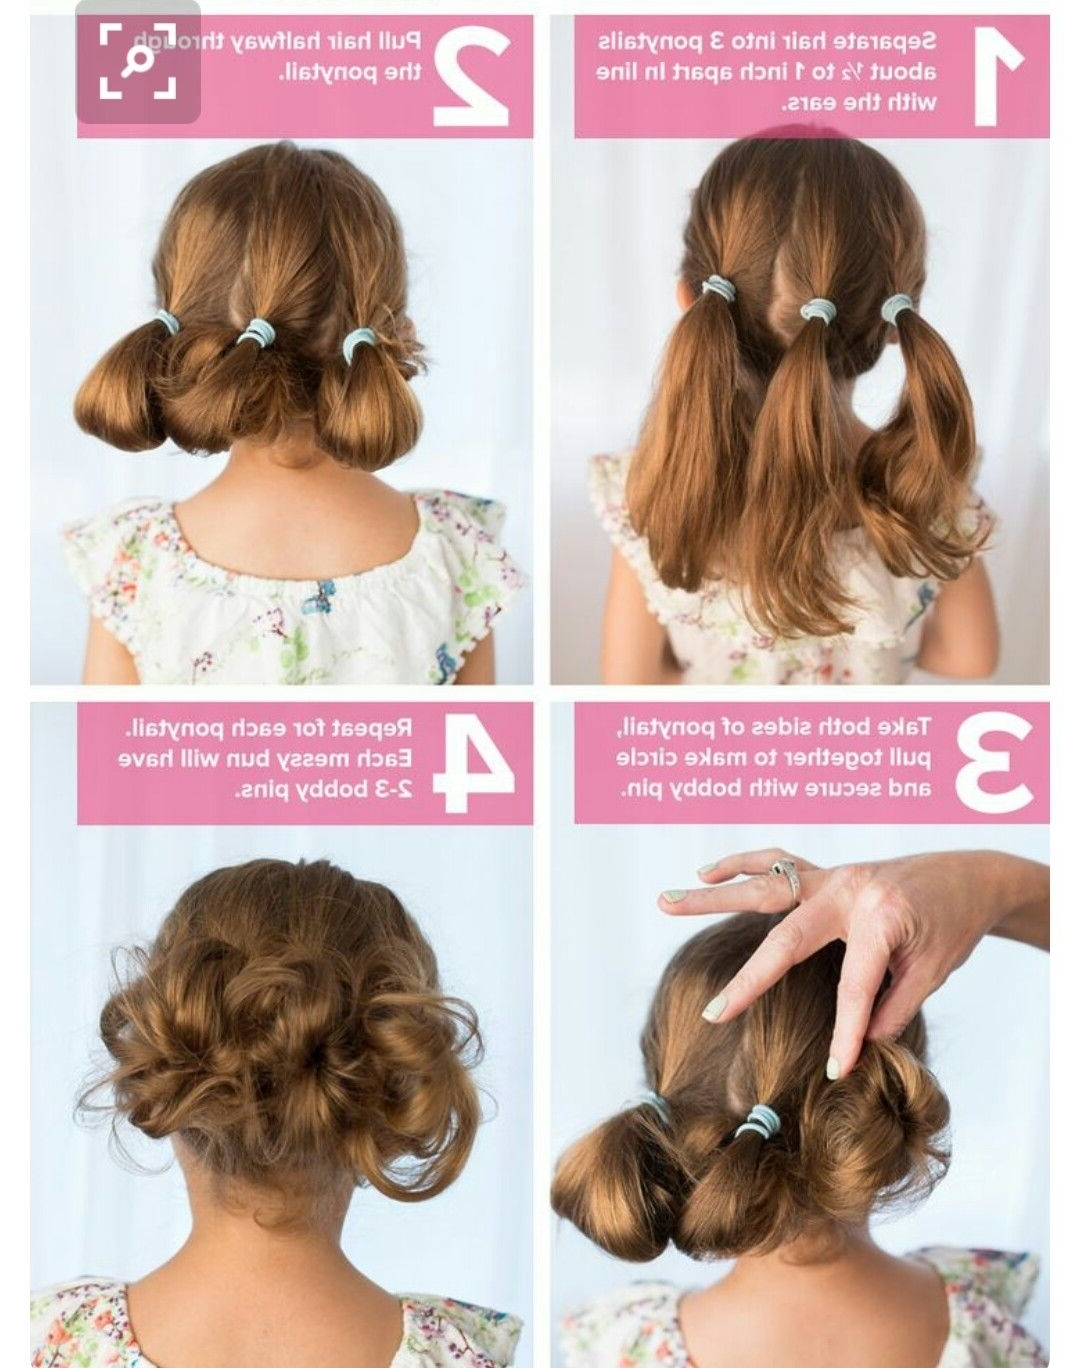 Strange Little Buns | Strange Flowers | Pinterest | Hair Style, Girl Throughout Little Girl Updo Hairstyles (View 4 of 15)